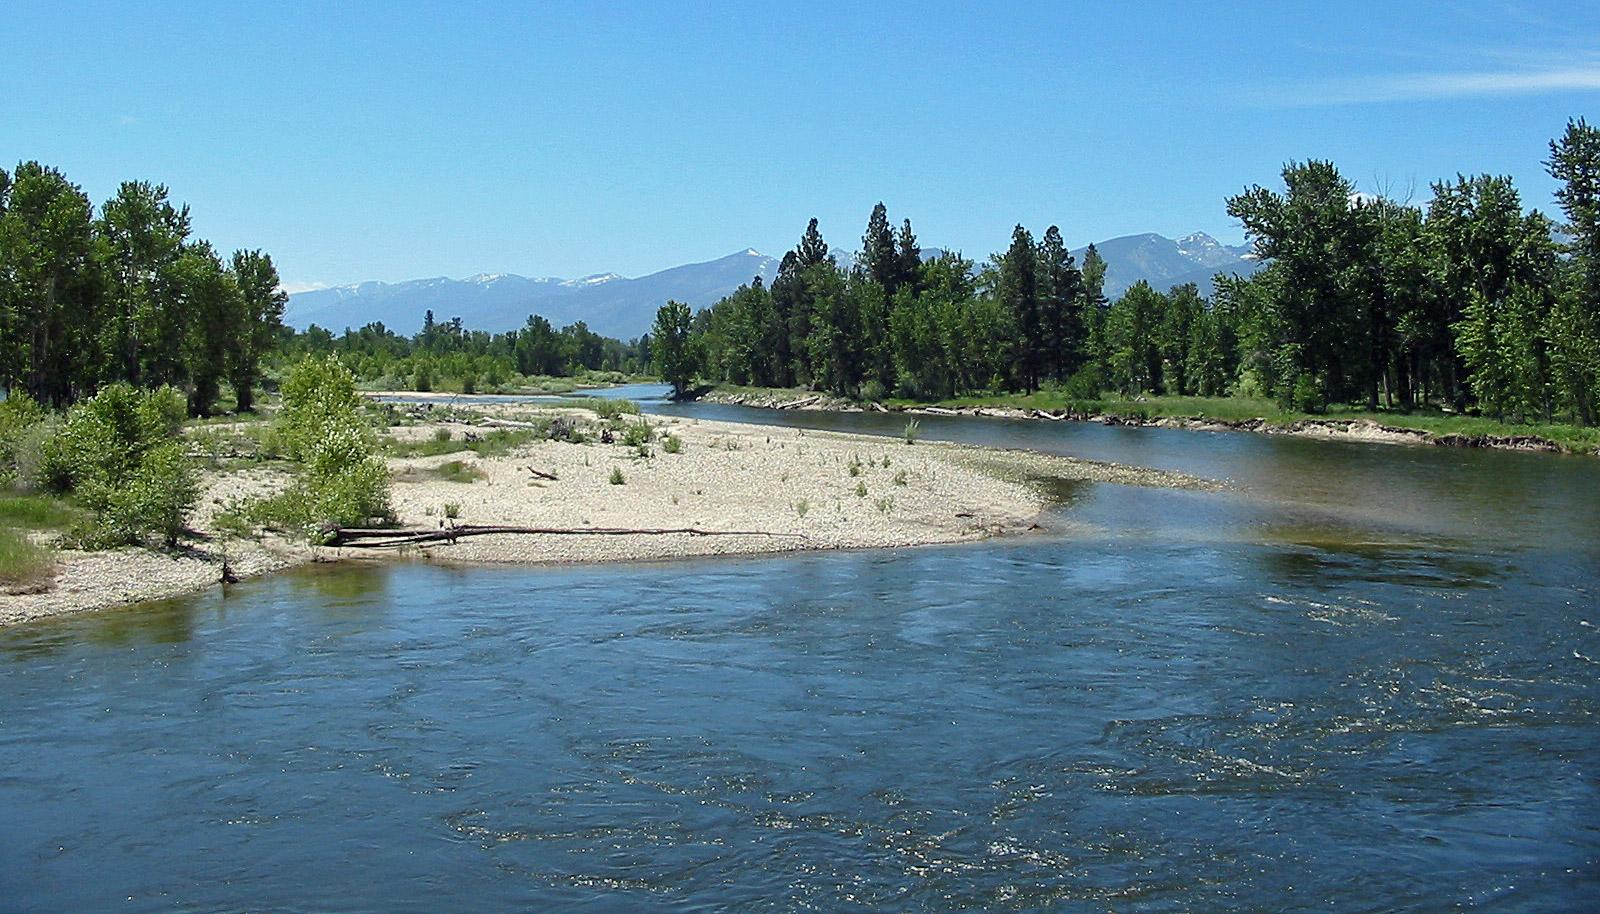 Bitterroot River Photographs | Photos of the Bitterroot ...